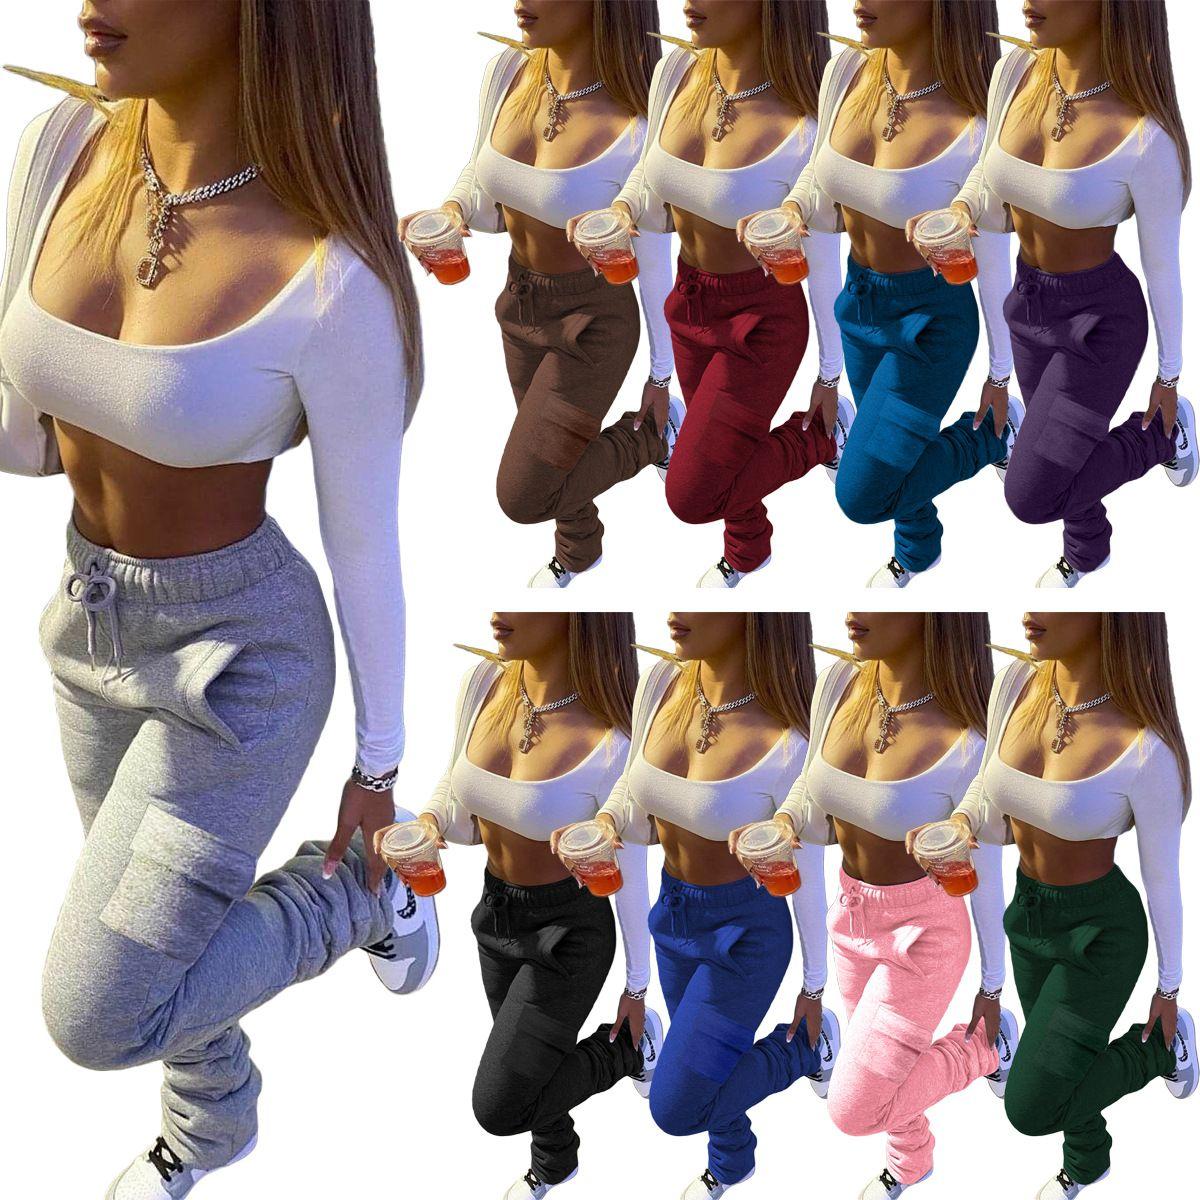 Pantaloni da donna in pile calda spessa spessa impilata pantaloni tutela all'ingrosso streetwear coulisse flare pantaloni tendenza joggers pantaloni sportivi femminili